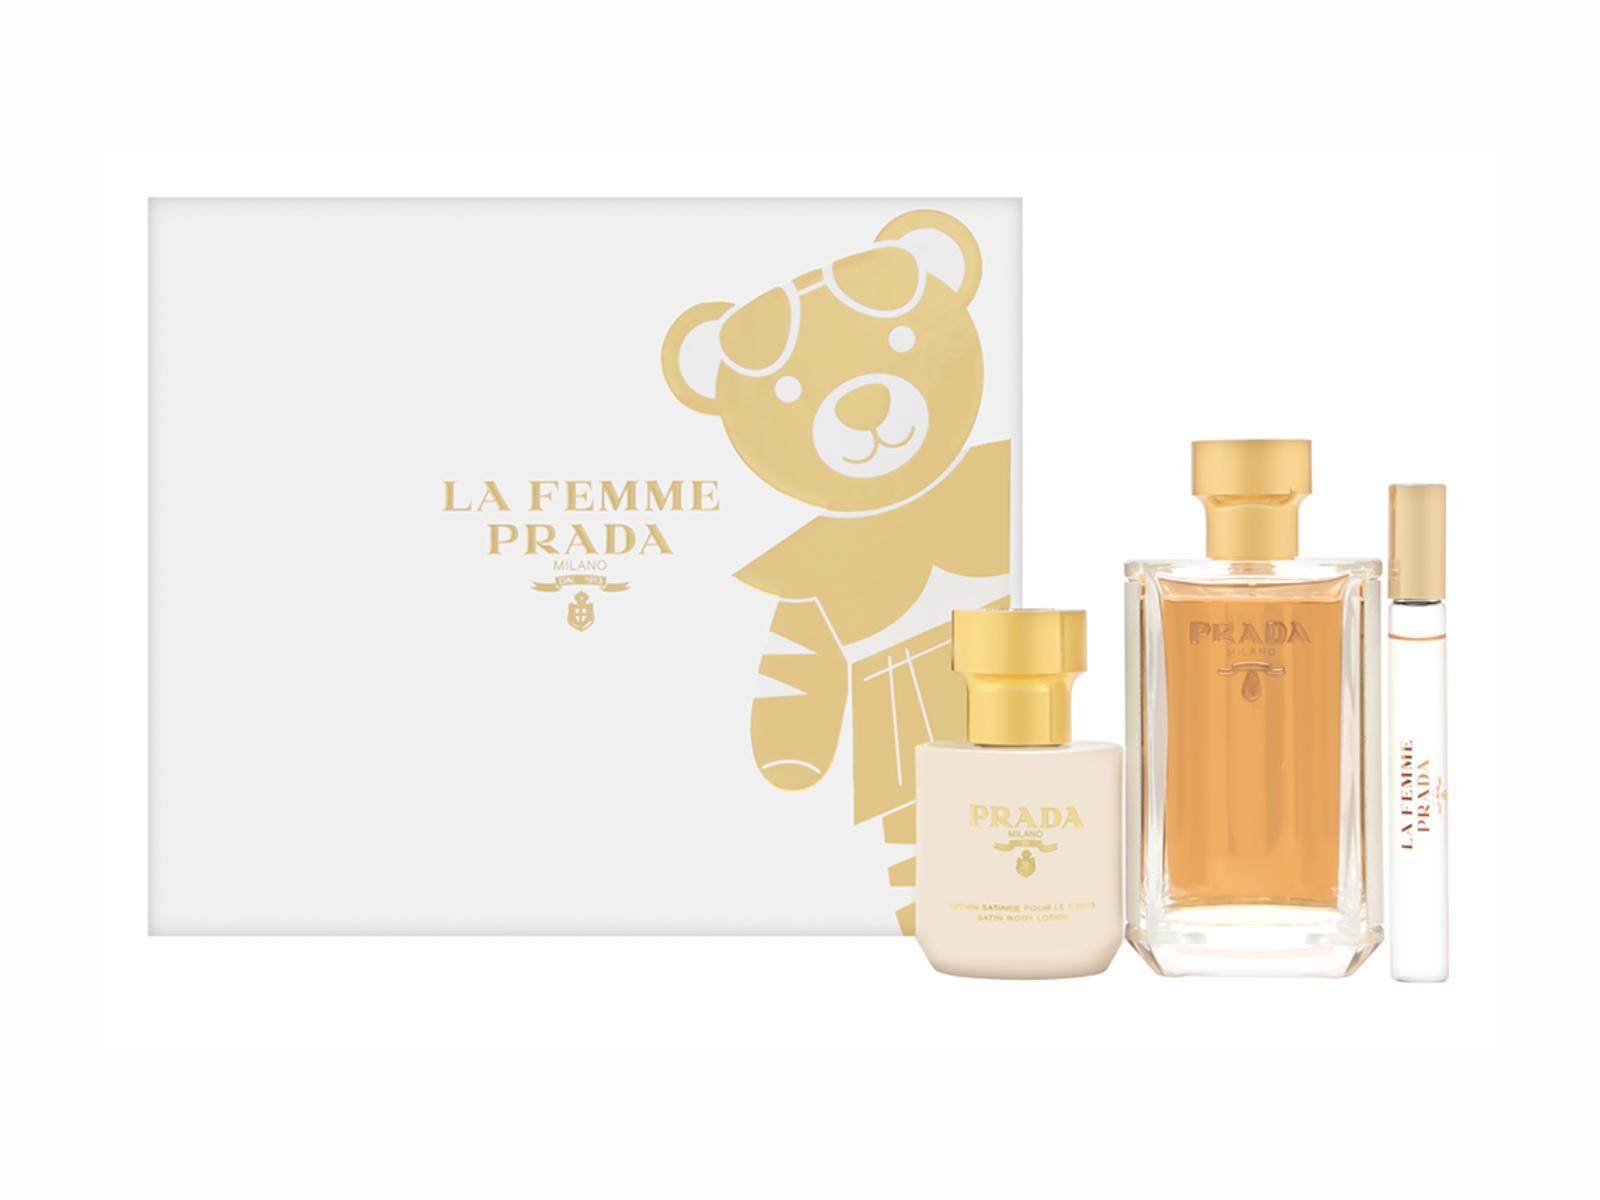 Prada La Femme Eau De Parfum 100ML Set